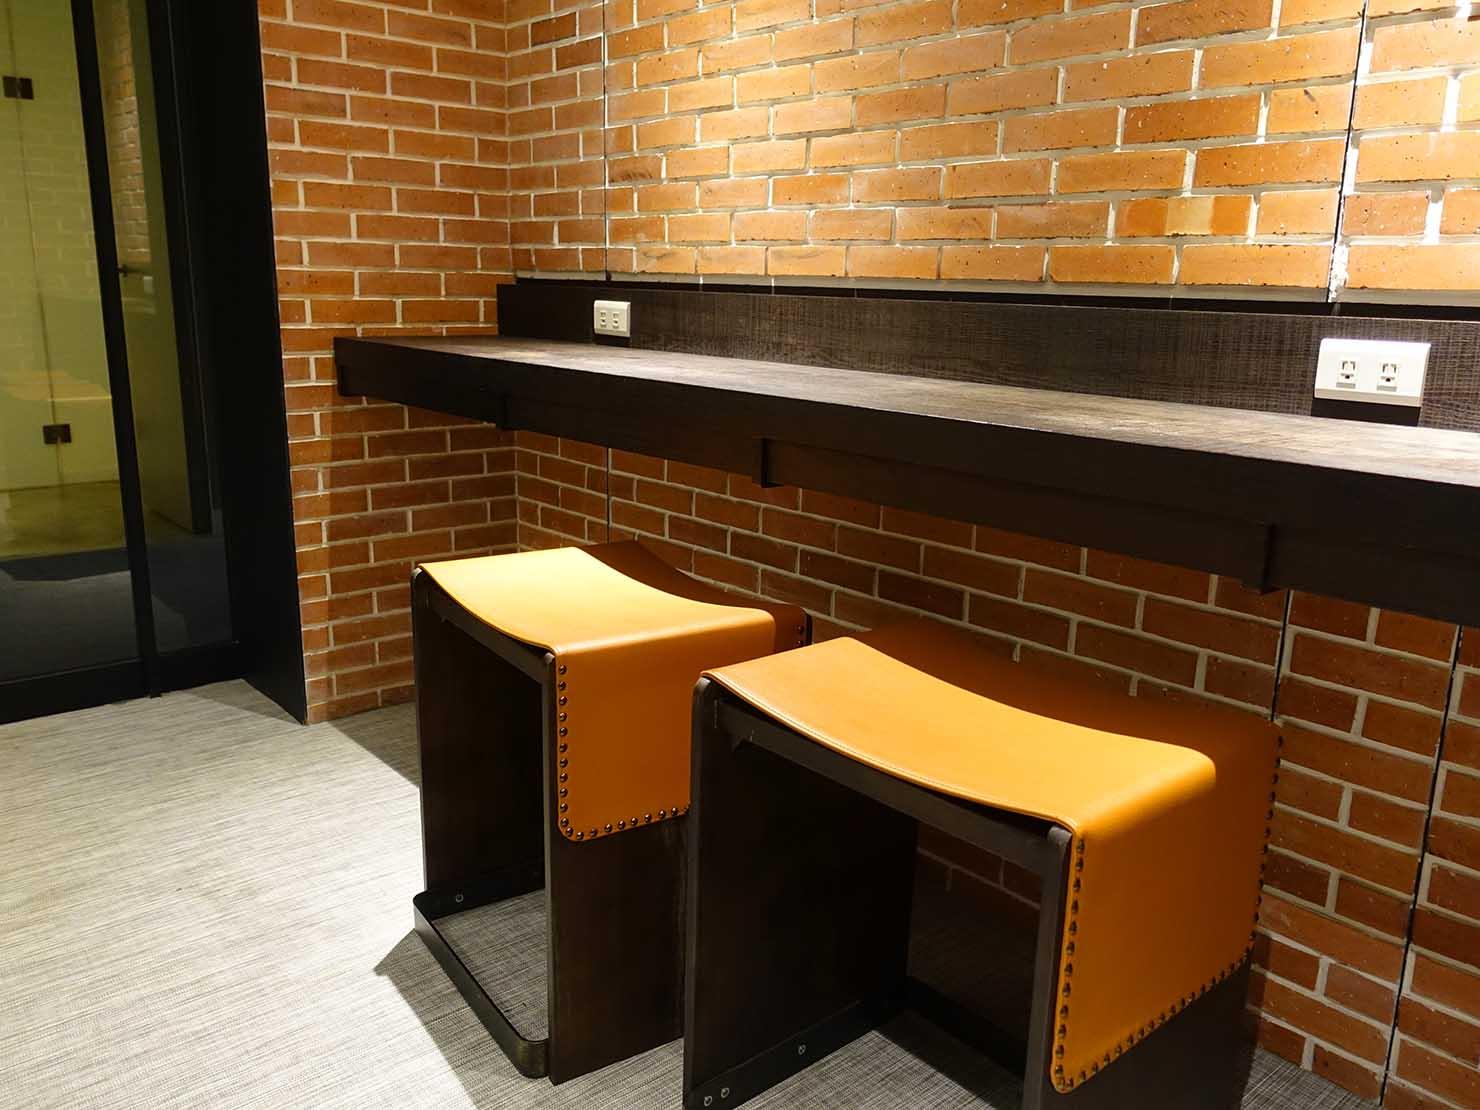 DSC00788-min高雄市内観光におすすめのホテル「GREET INN 喜迎旅店」の豪華雙人房(デラックスダブル)15Fランドリールームのテーブル